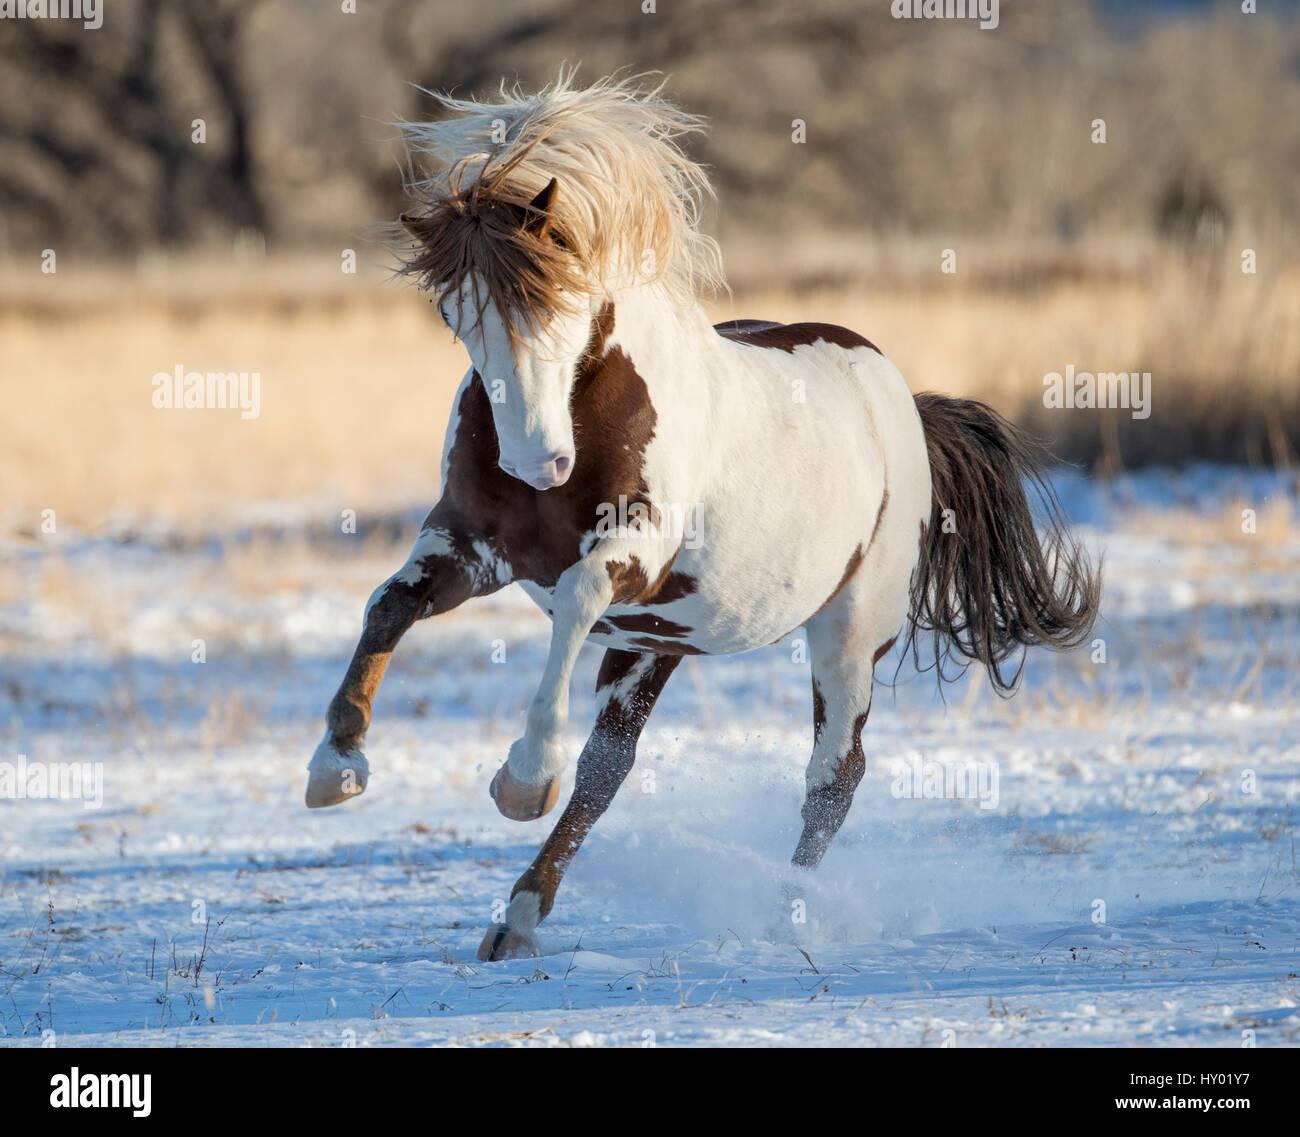 Wild Pinto Mustang Stallion Running In Snow Black Hills Wild Horse Stock Photo Alamy